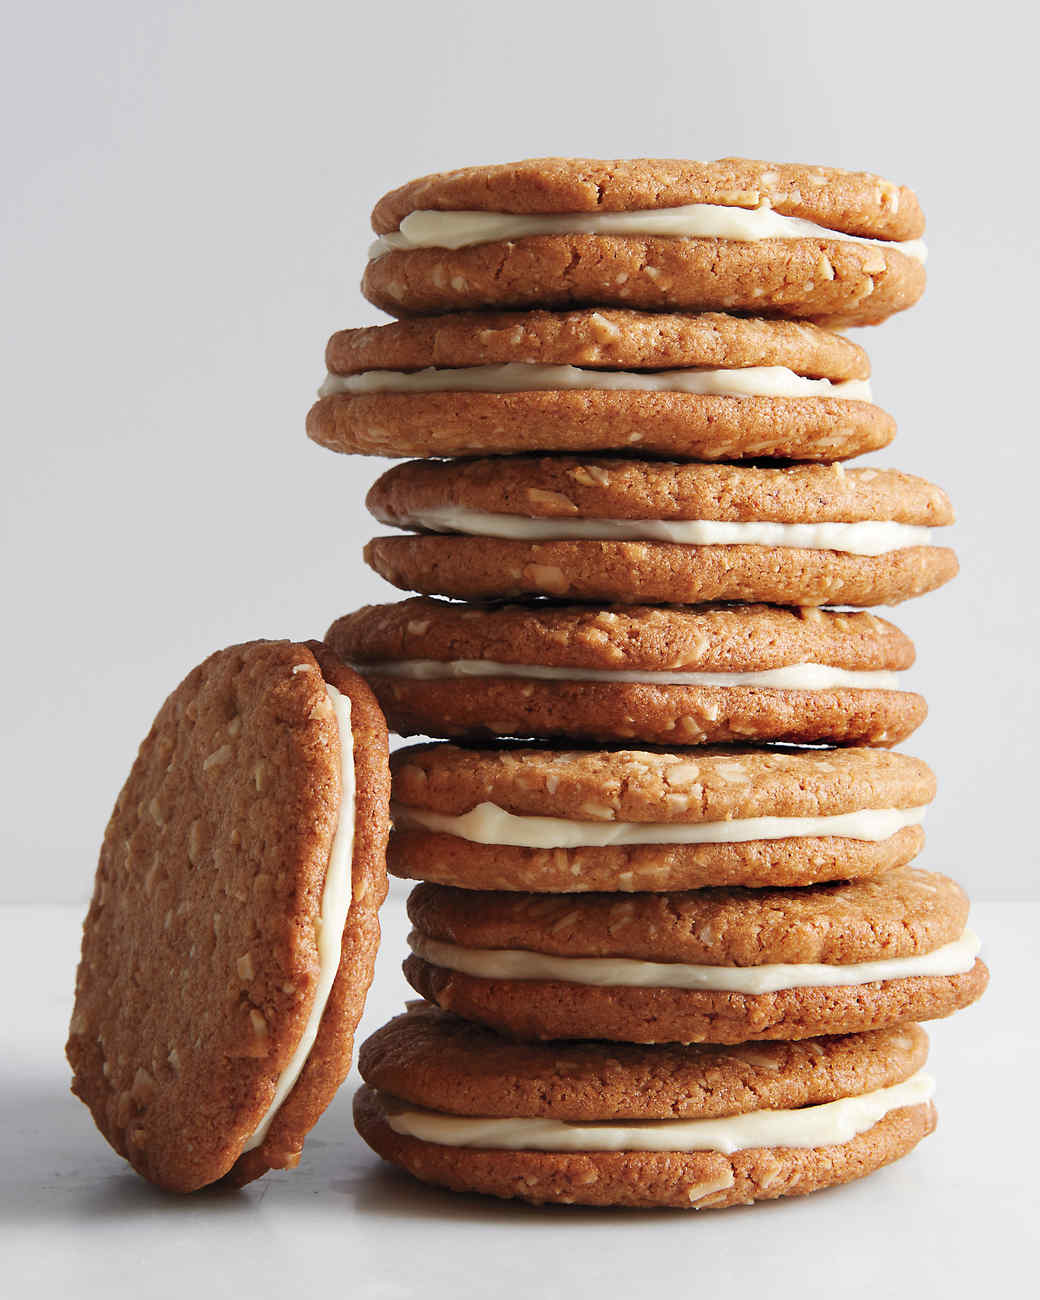 almond-butter-cookie-md110878.jpg